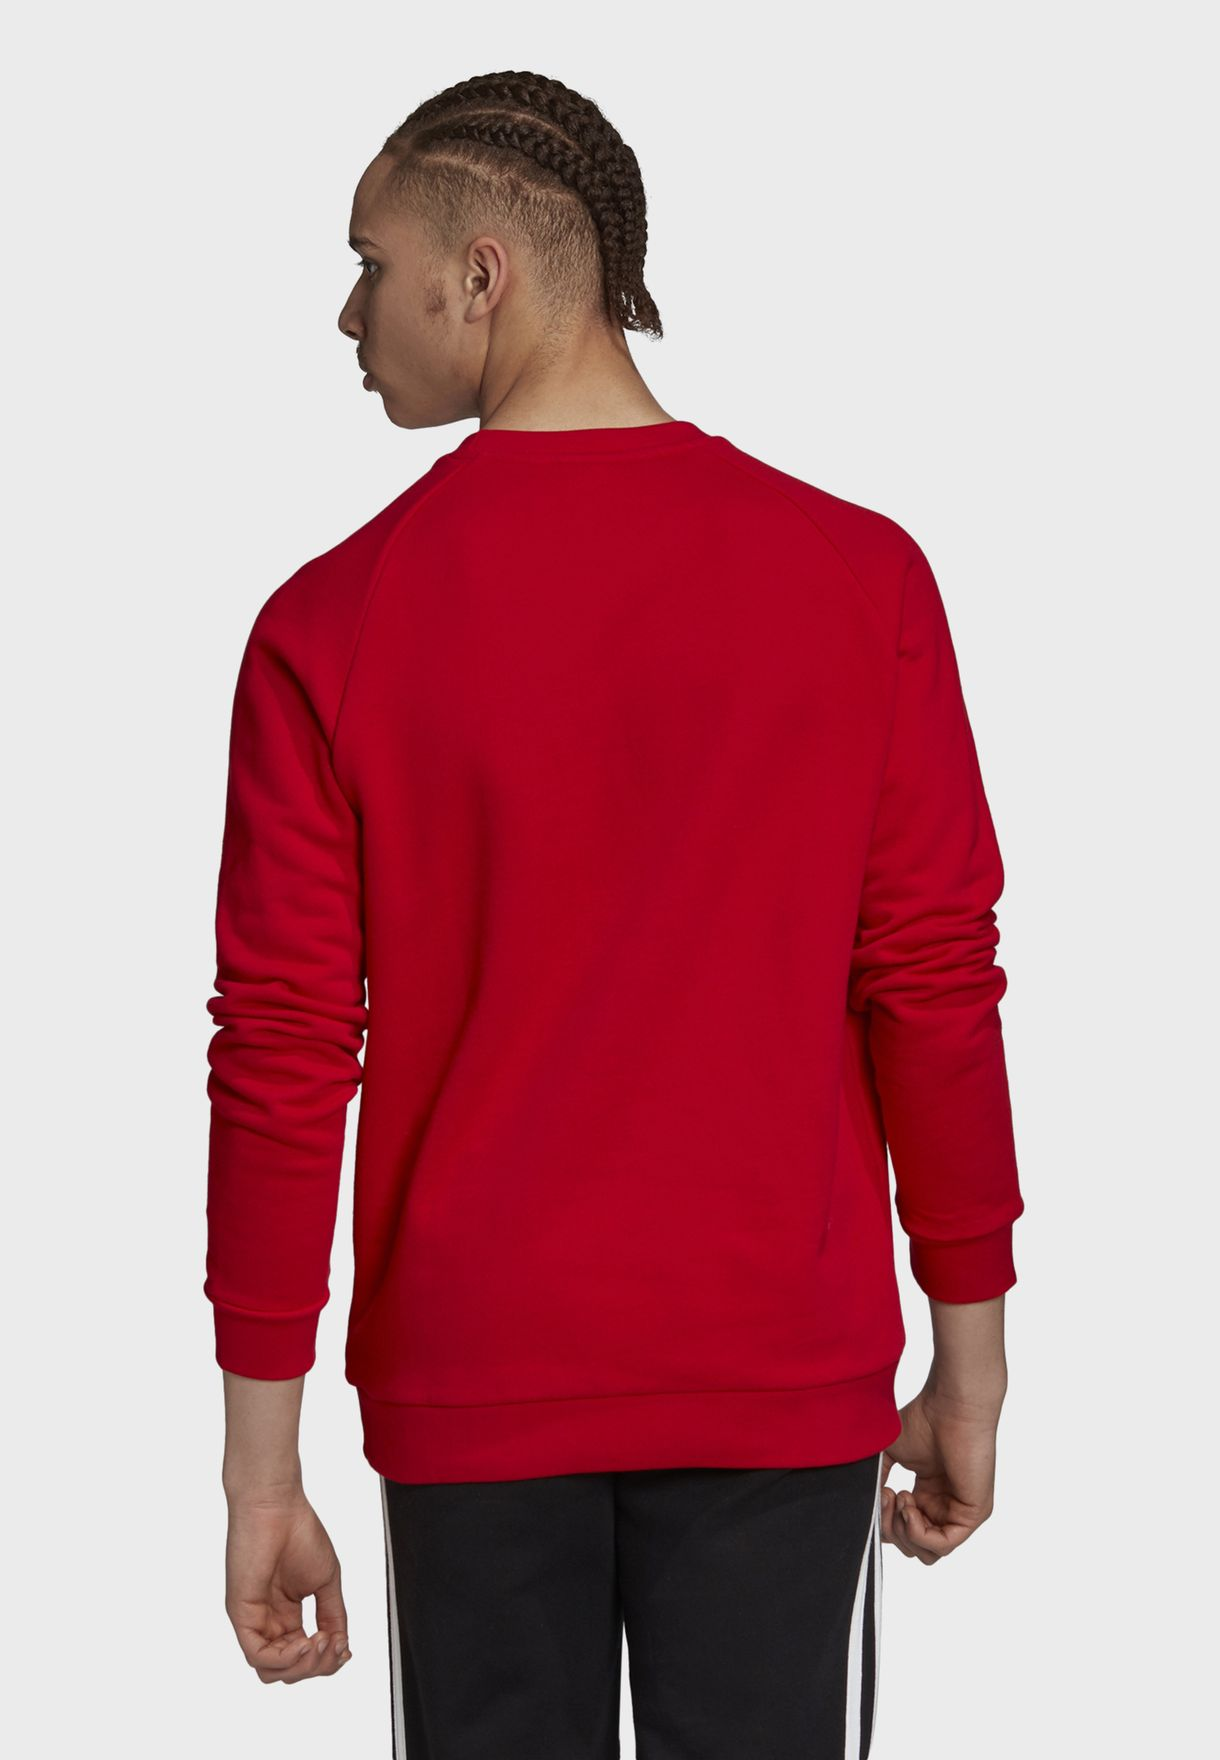 Trefoil Crew Adicolor Casual Men's Sweatshirt